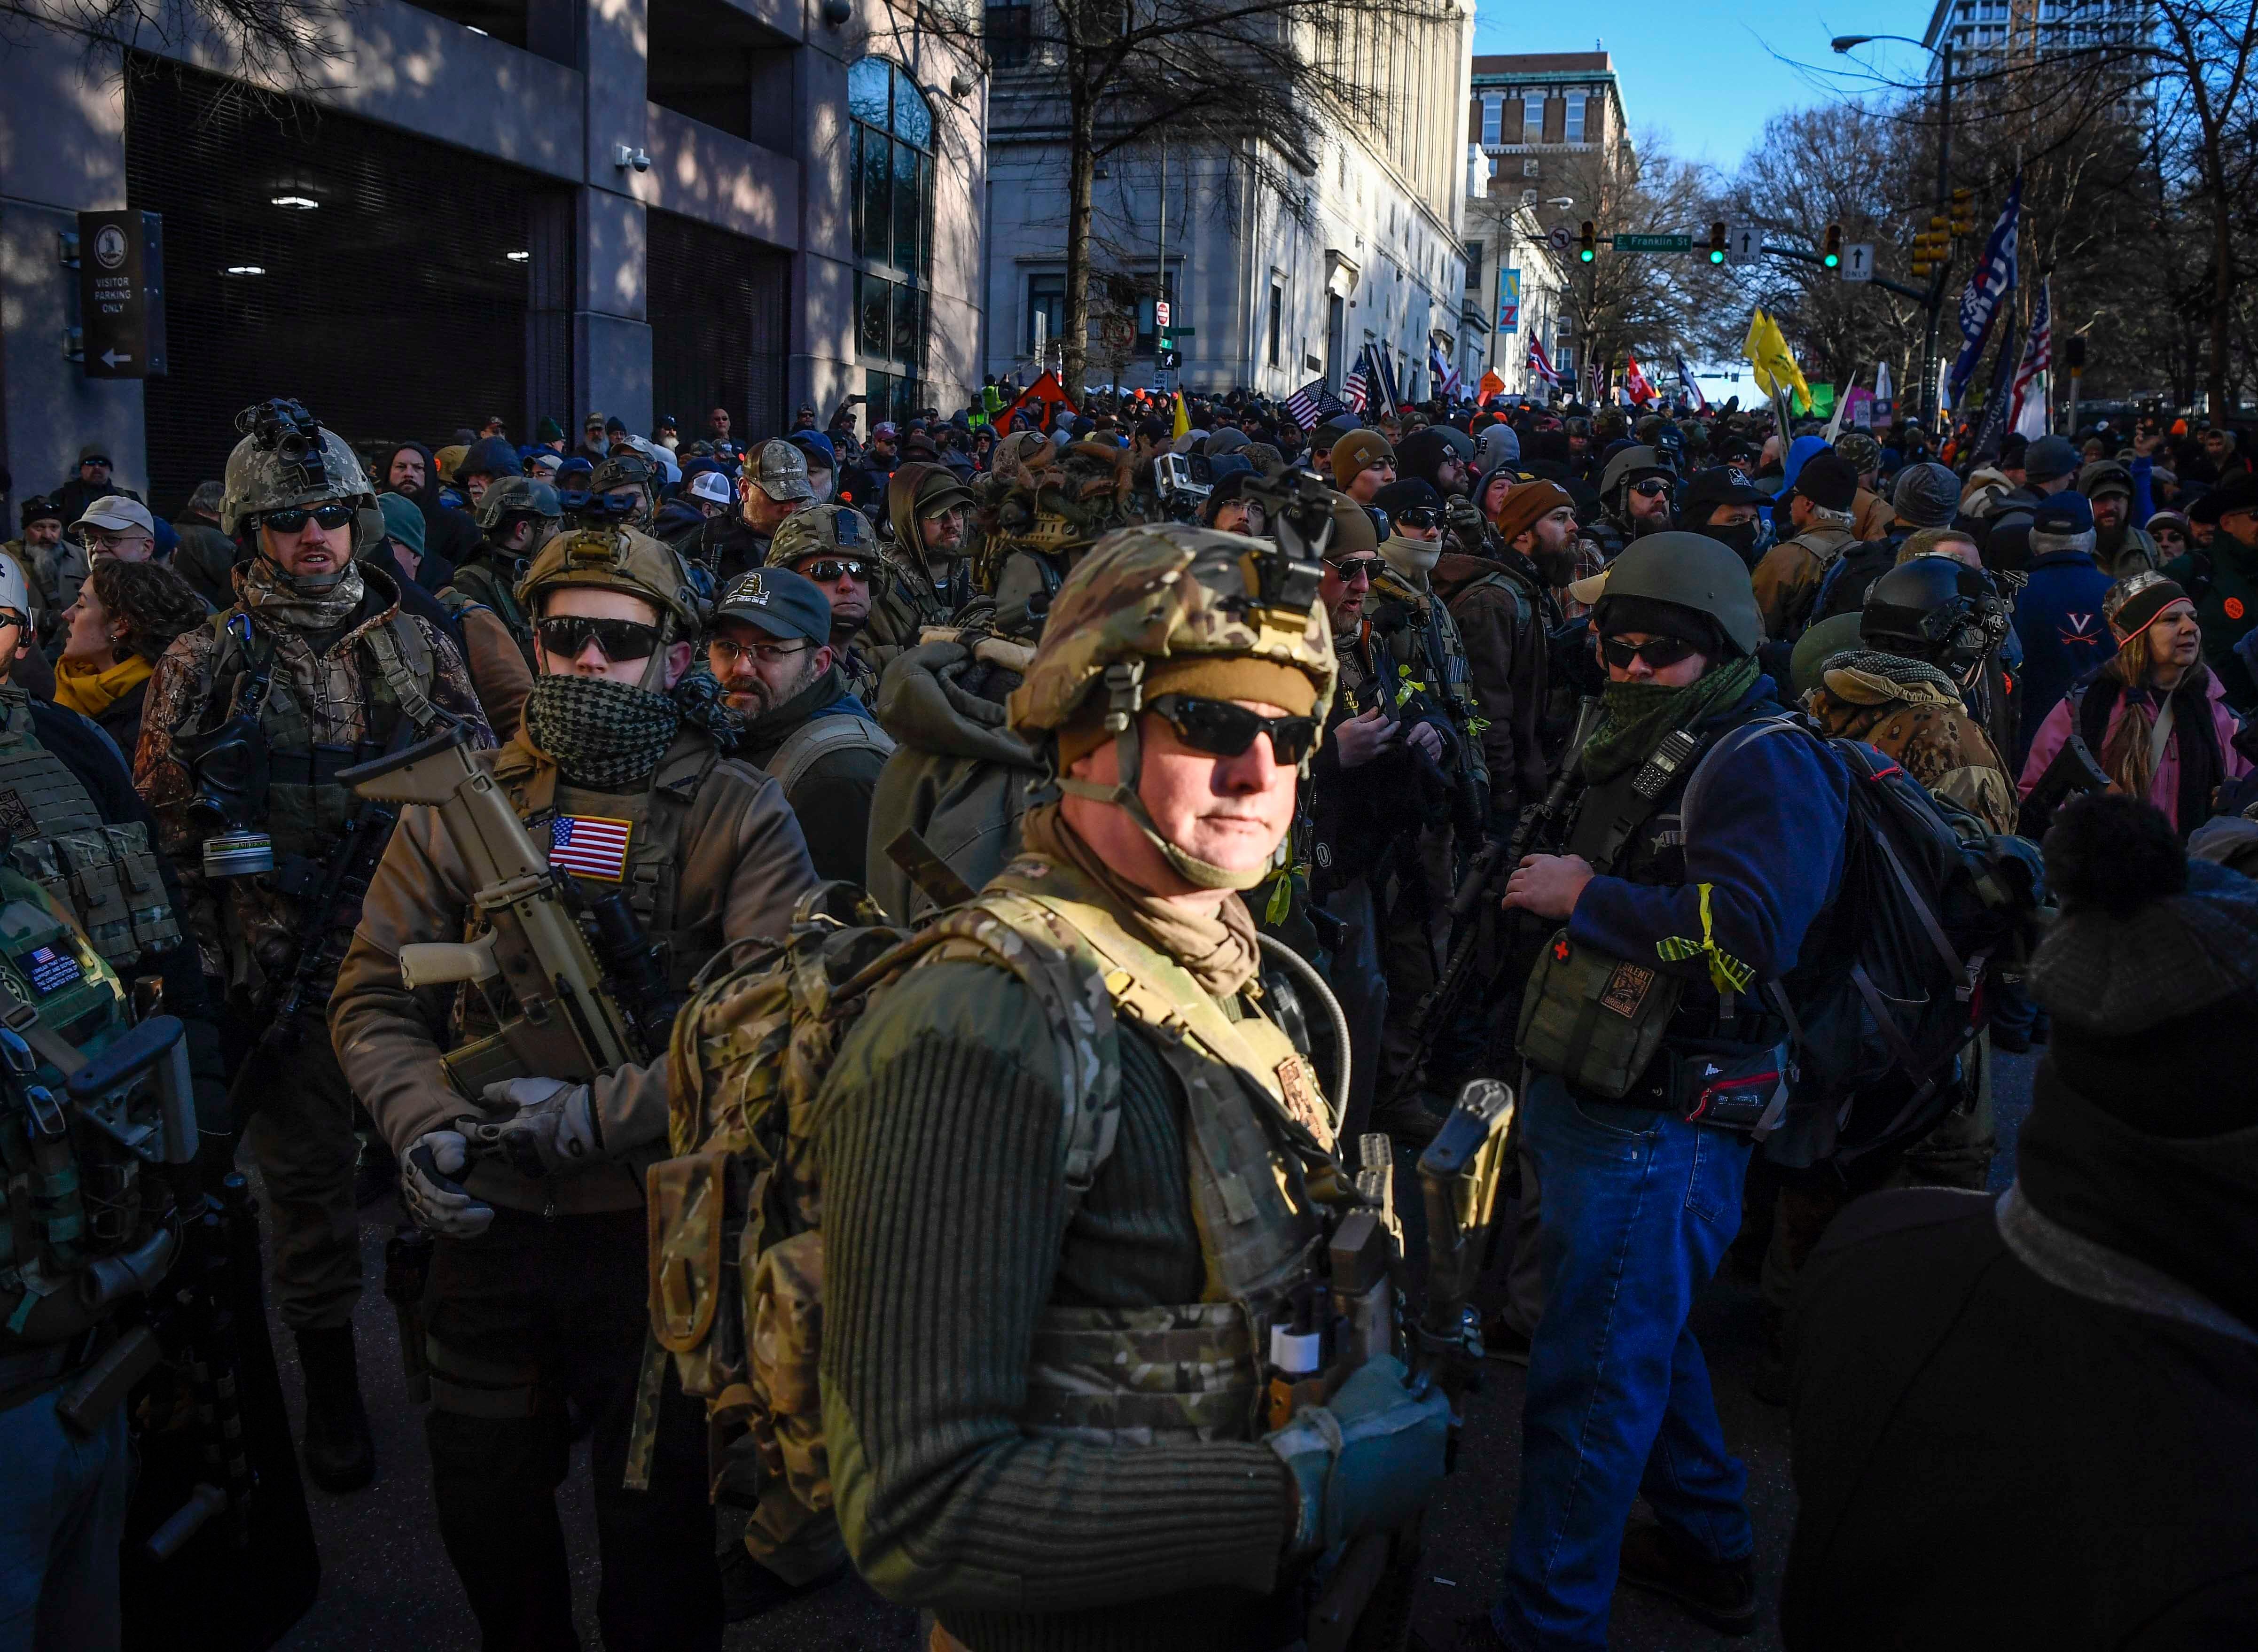 Virginia s ban on assault weapons sales blocked in Senate committee